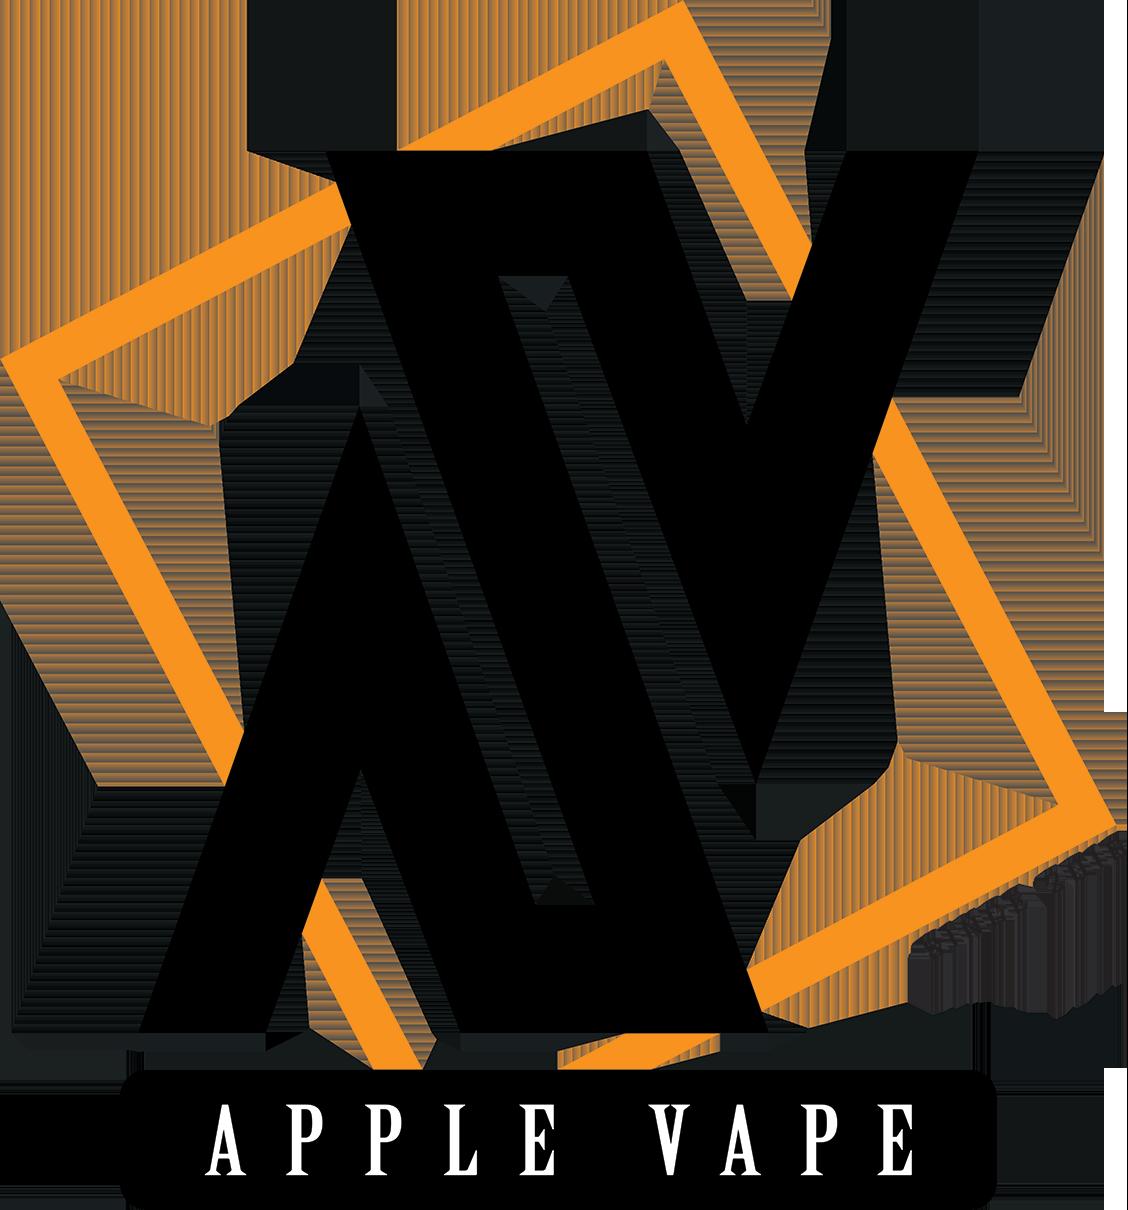 AppleVape | Vape Tân Phú | Chuyên cung cấp Vape